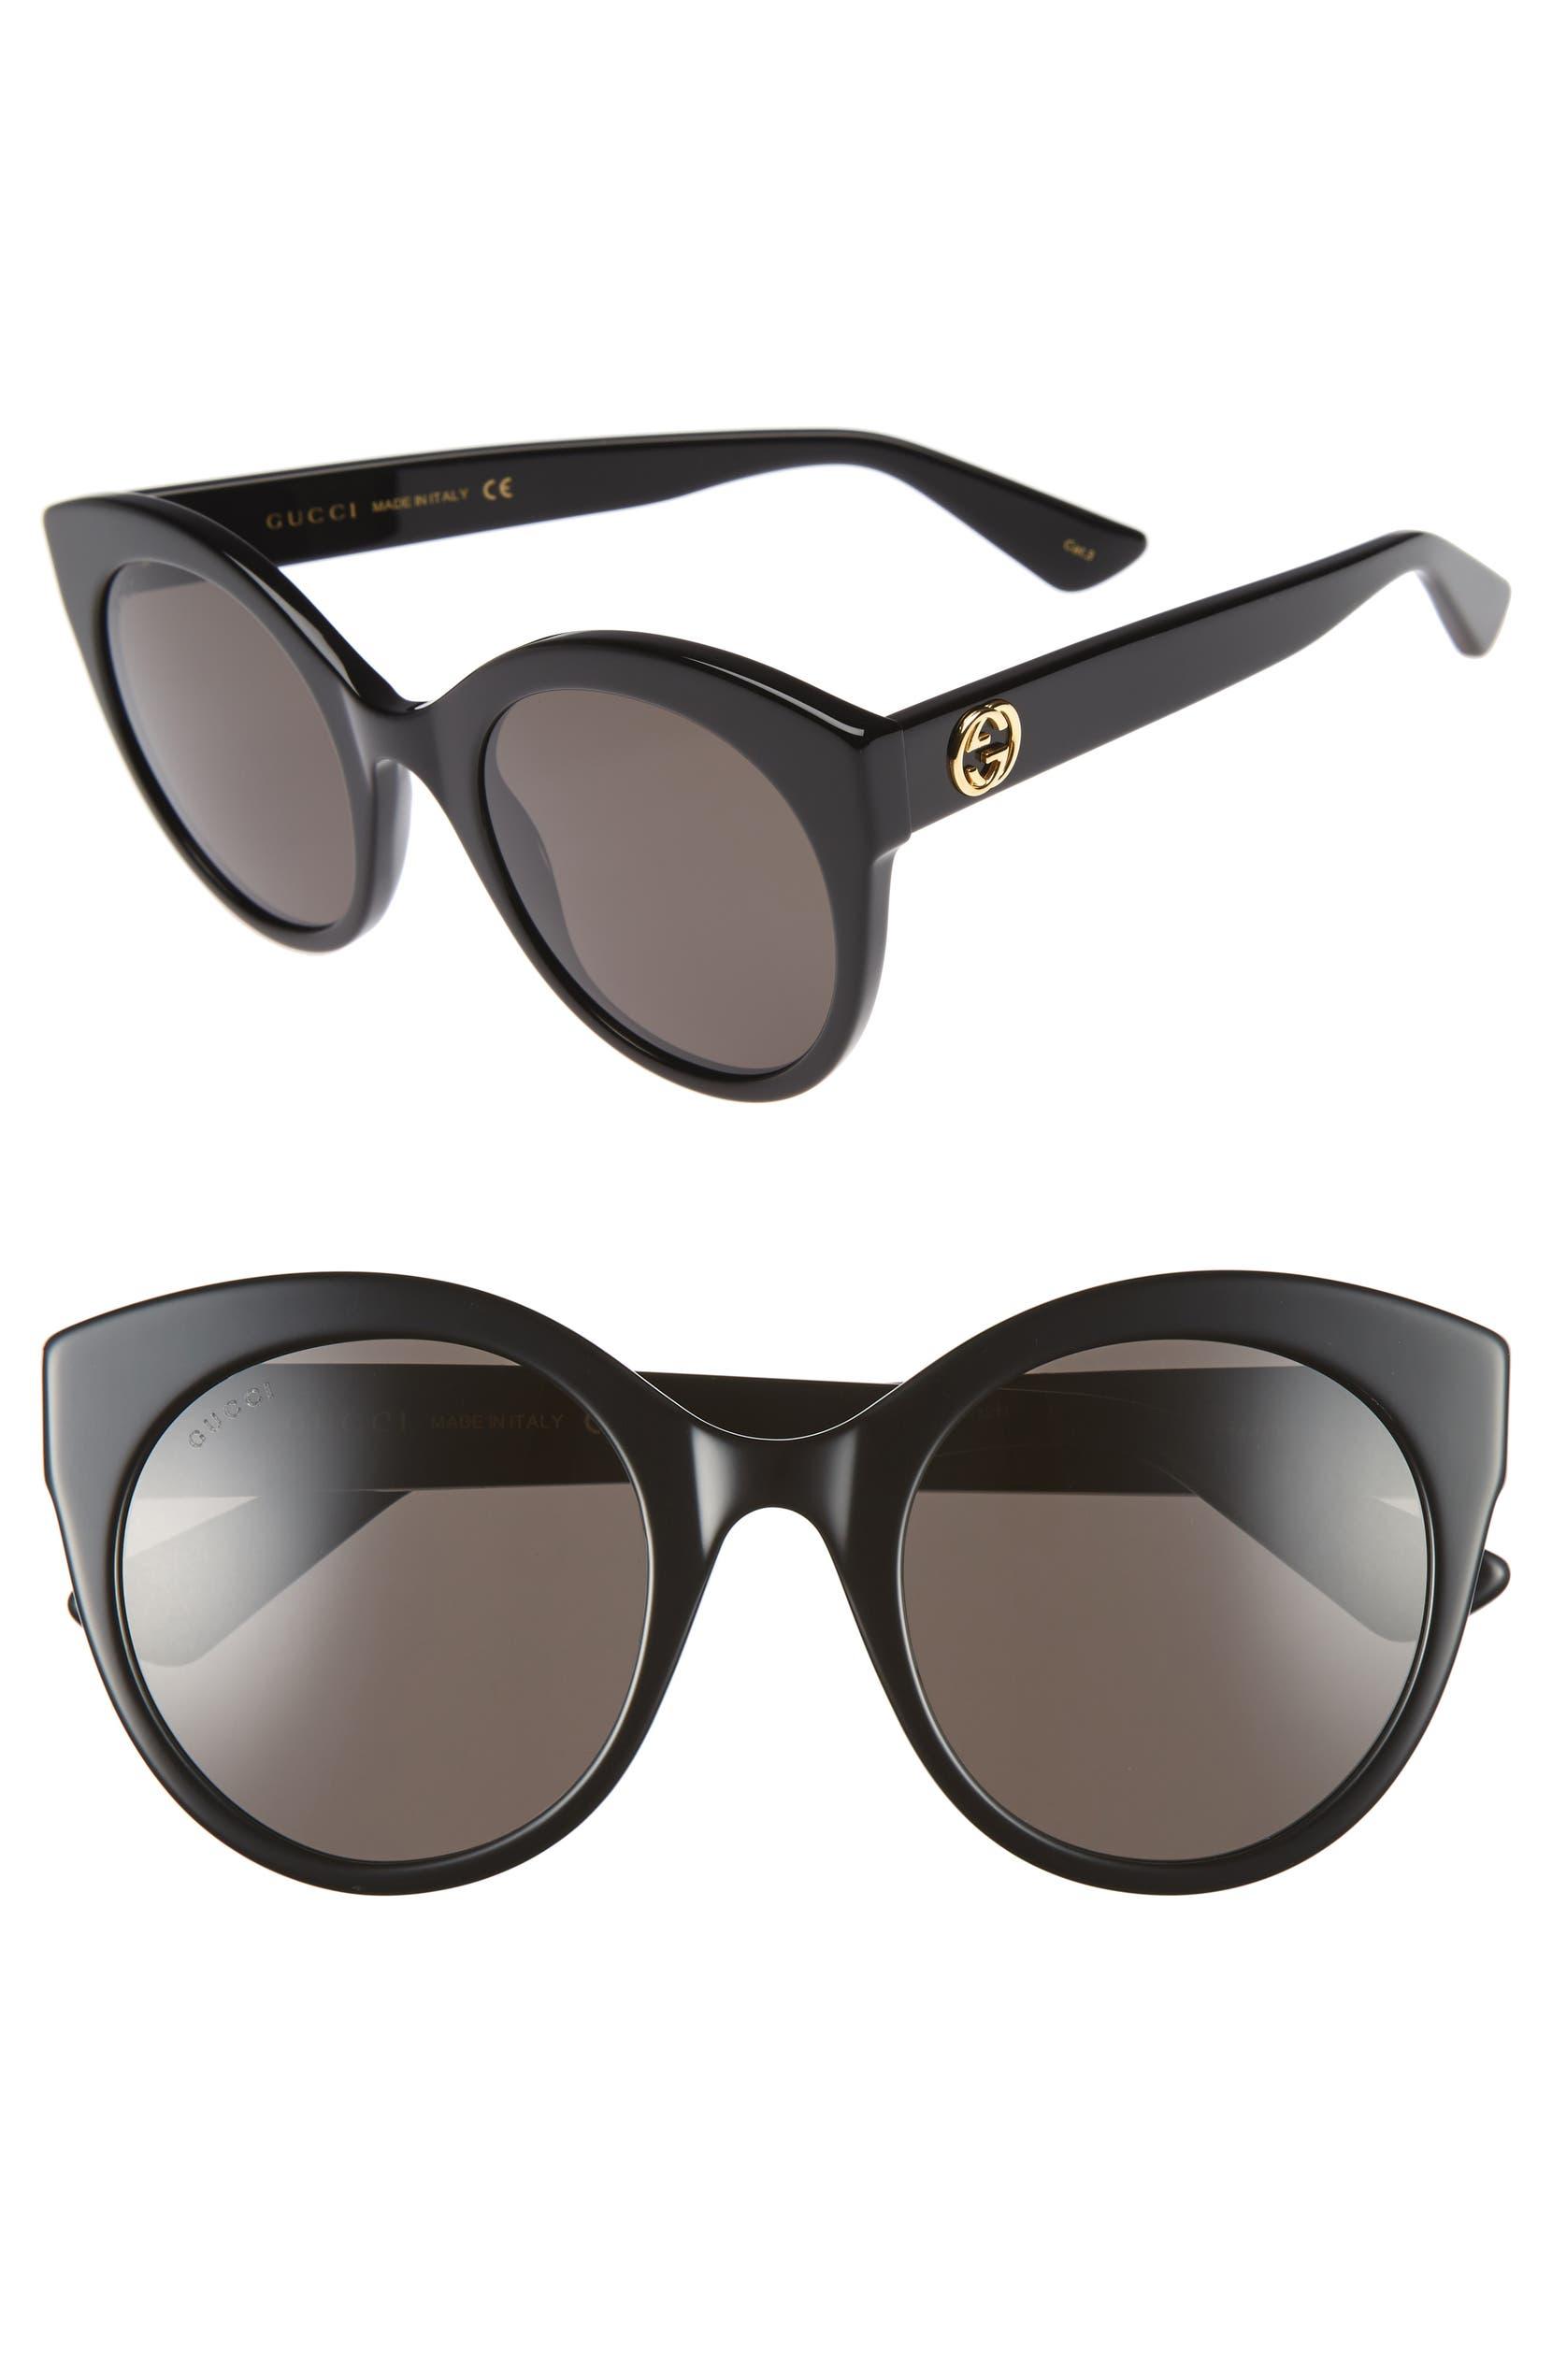 cbdd023a0fb Gucci 52mm Cat Eye Sunglasses